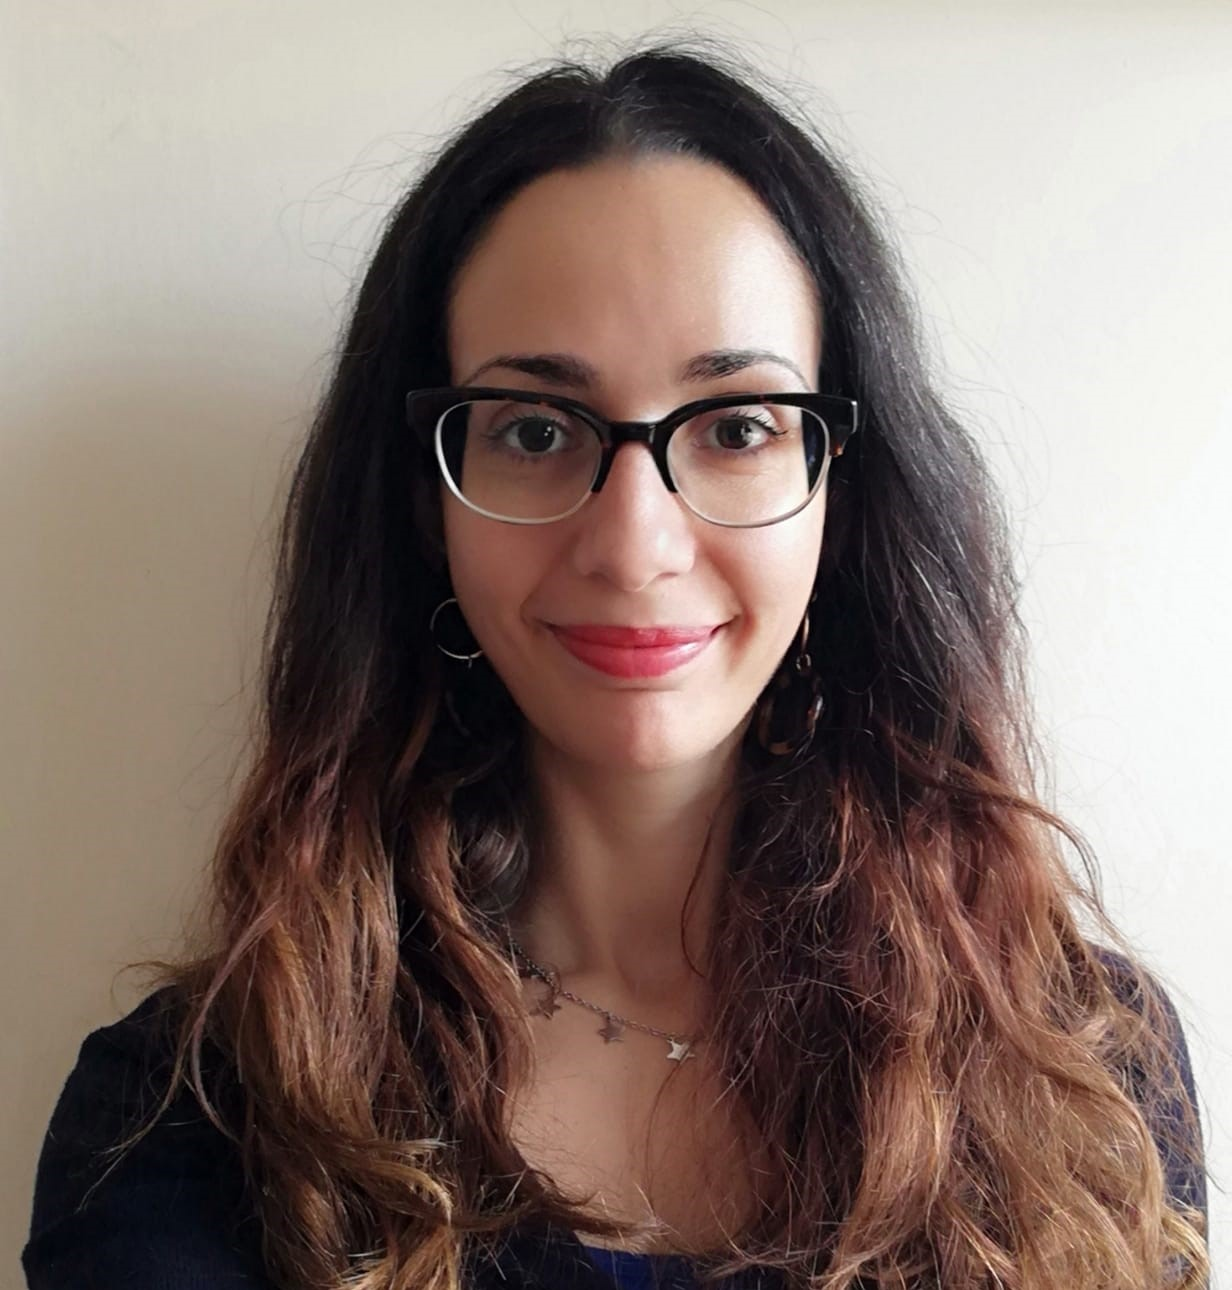 Gabriella Cioce